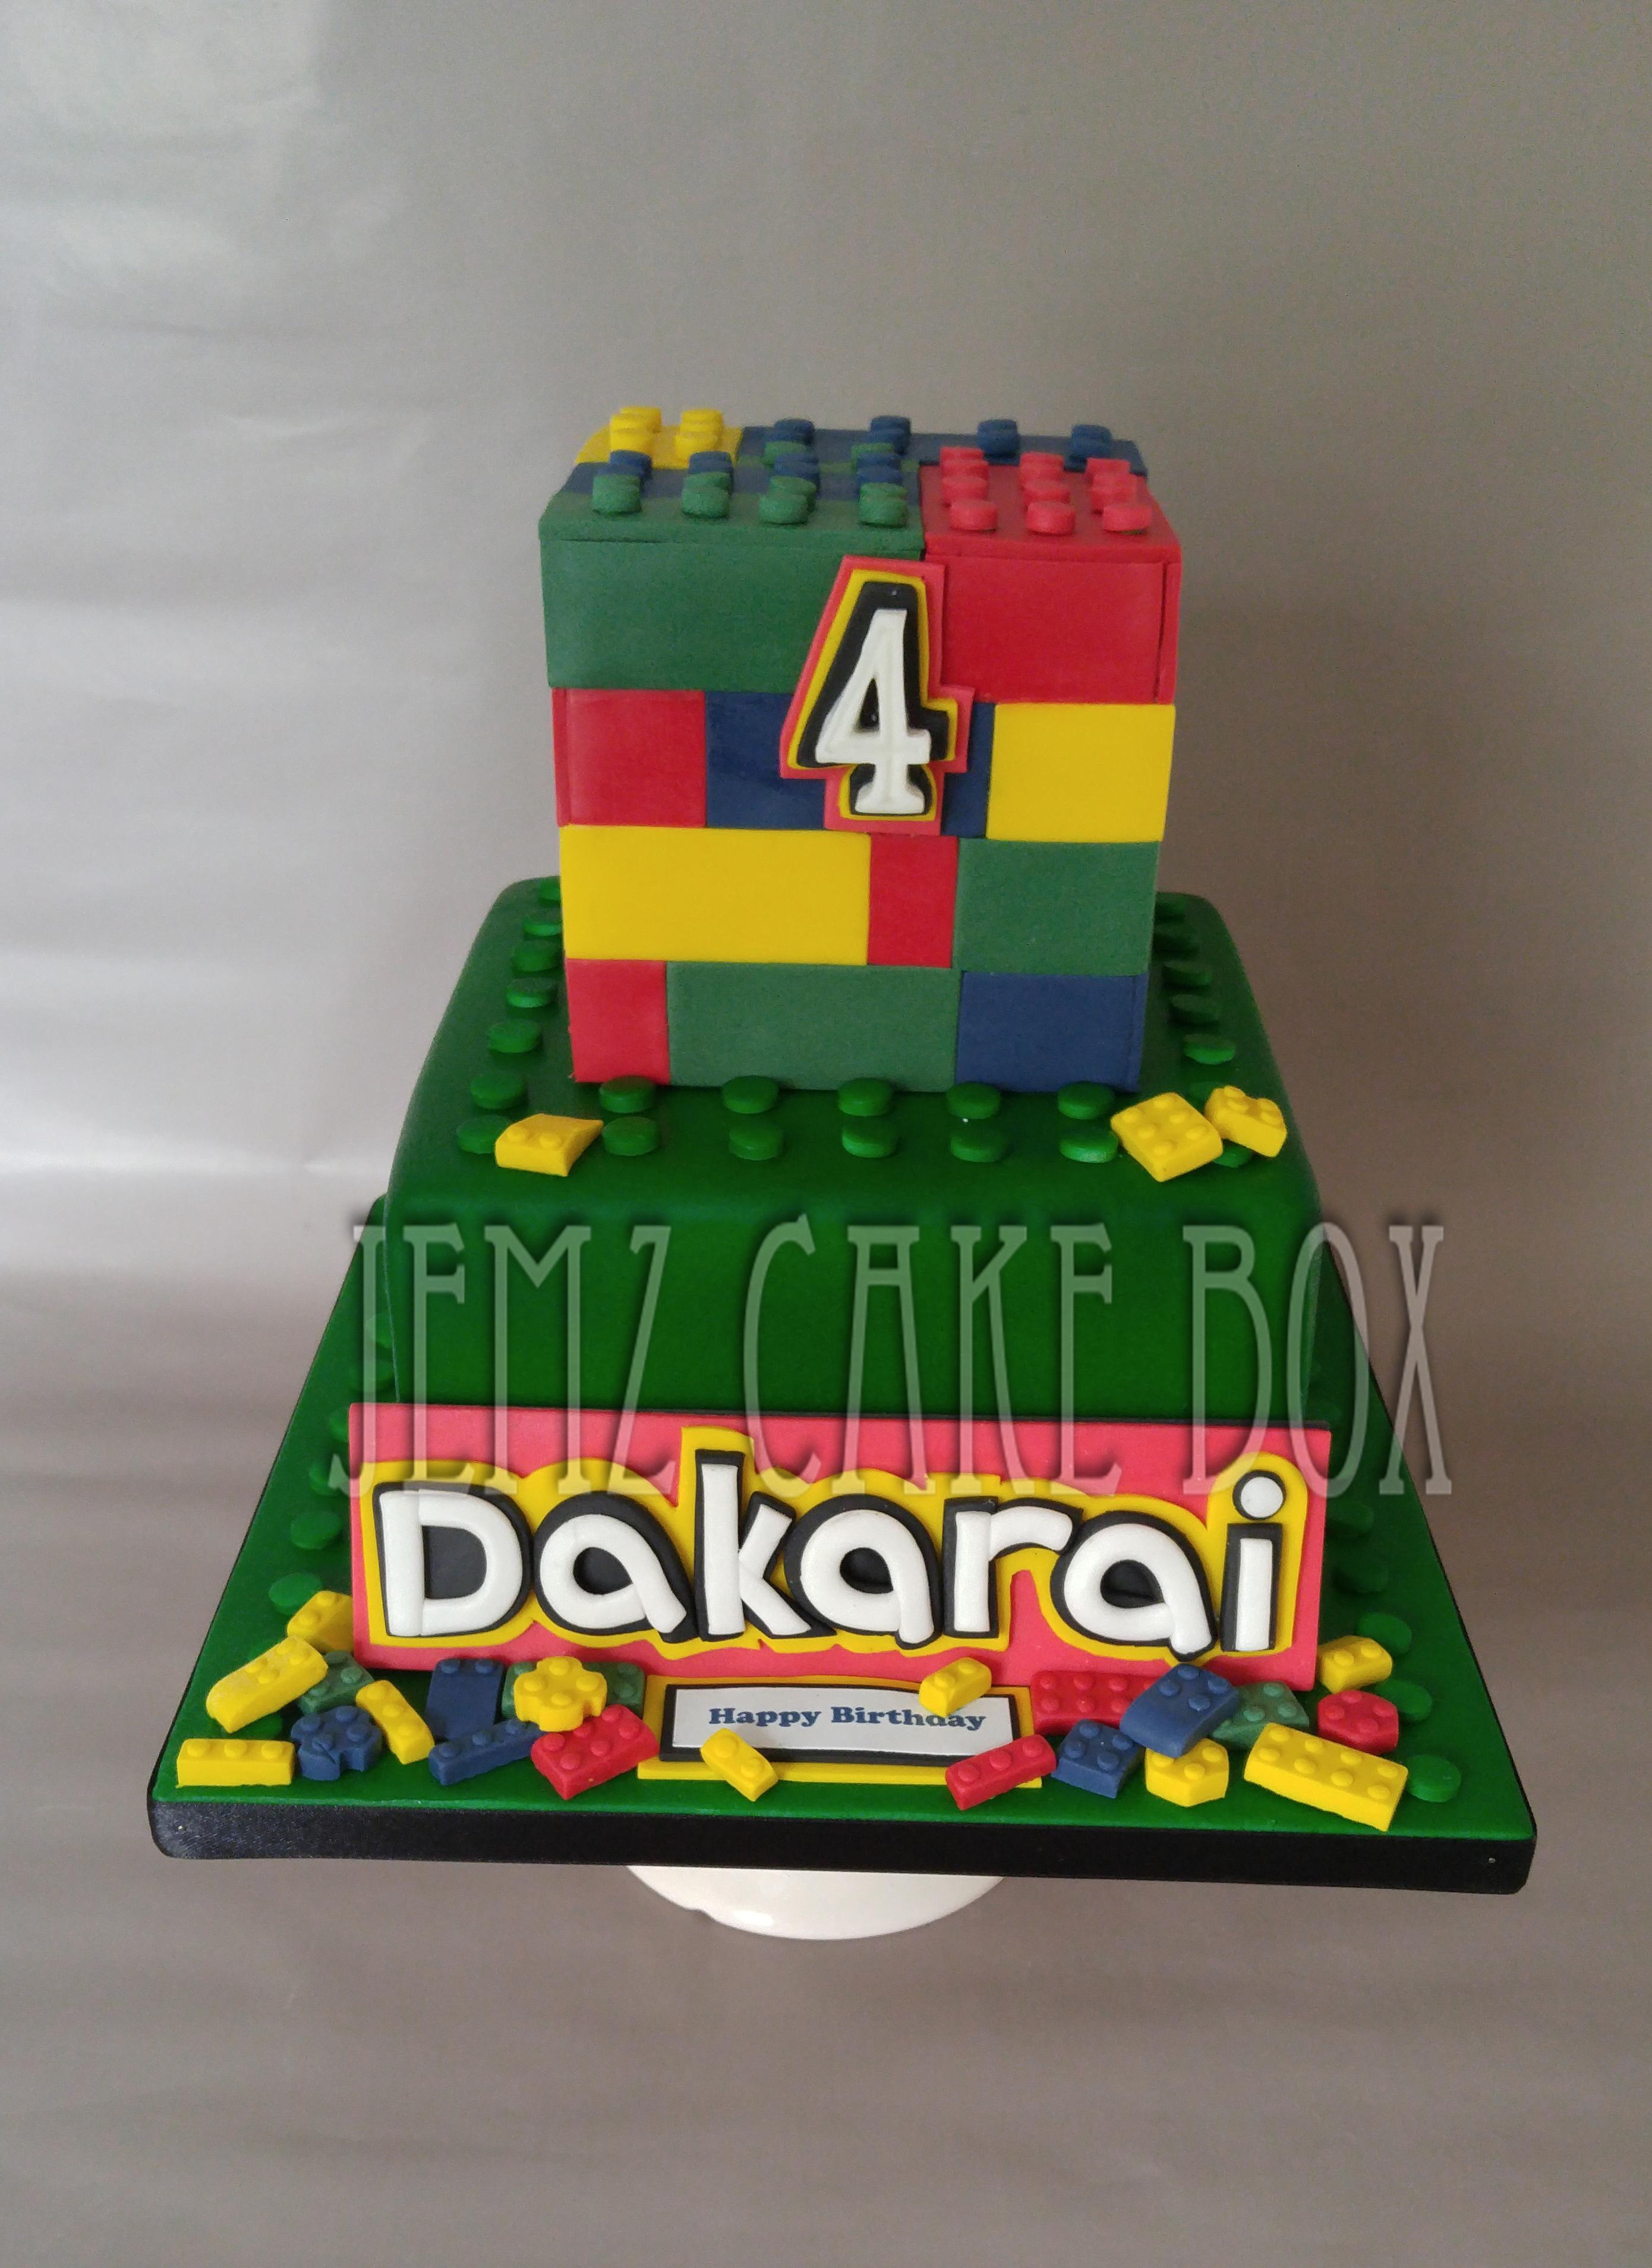 Lego Celebration Cake Jemz Cake Box